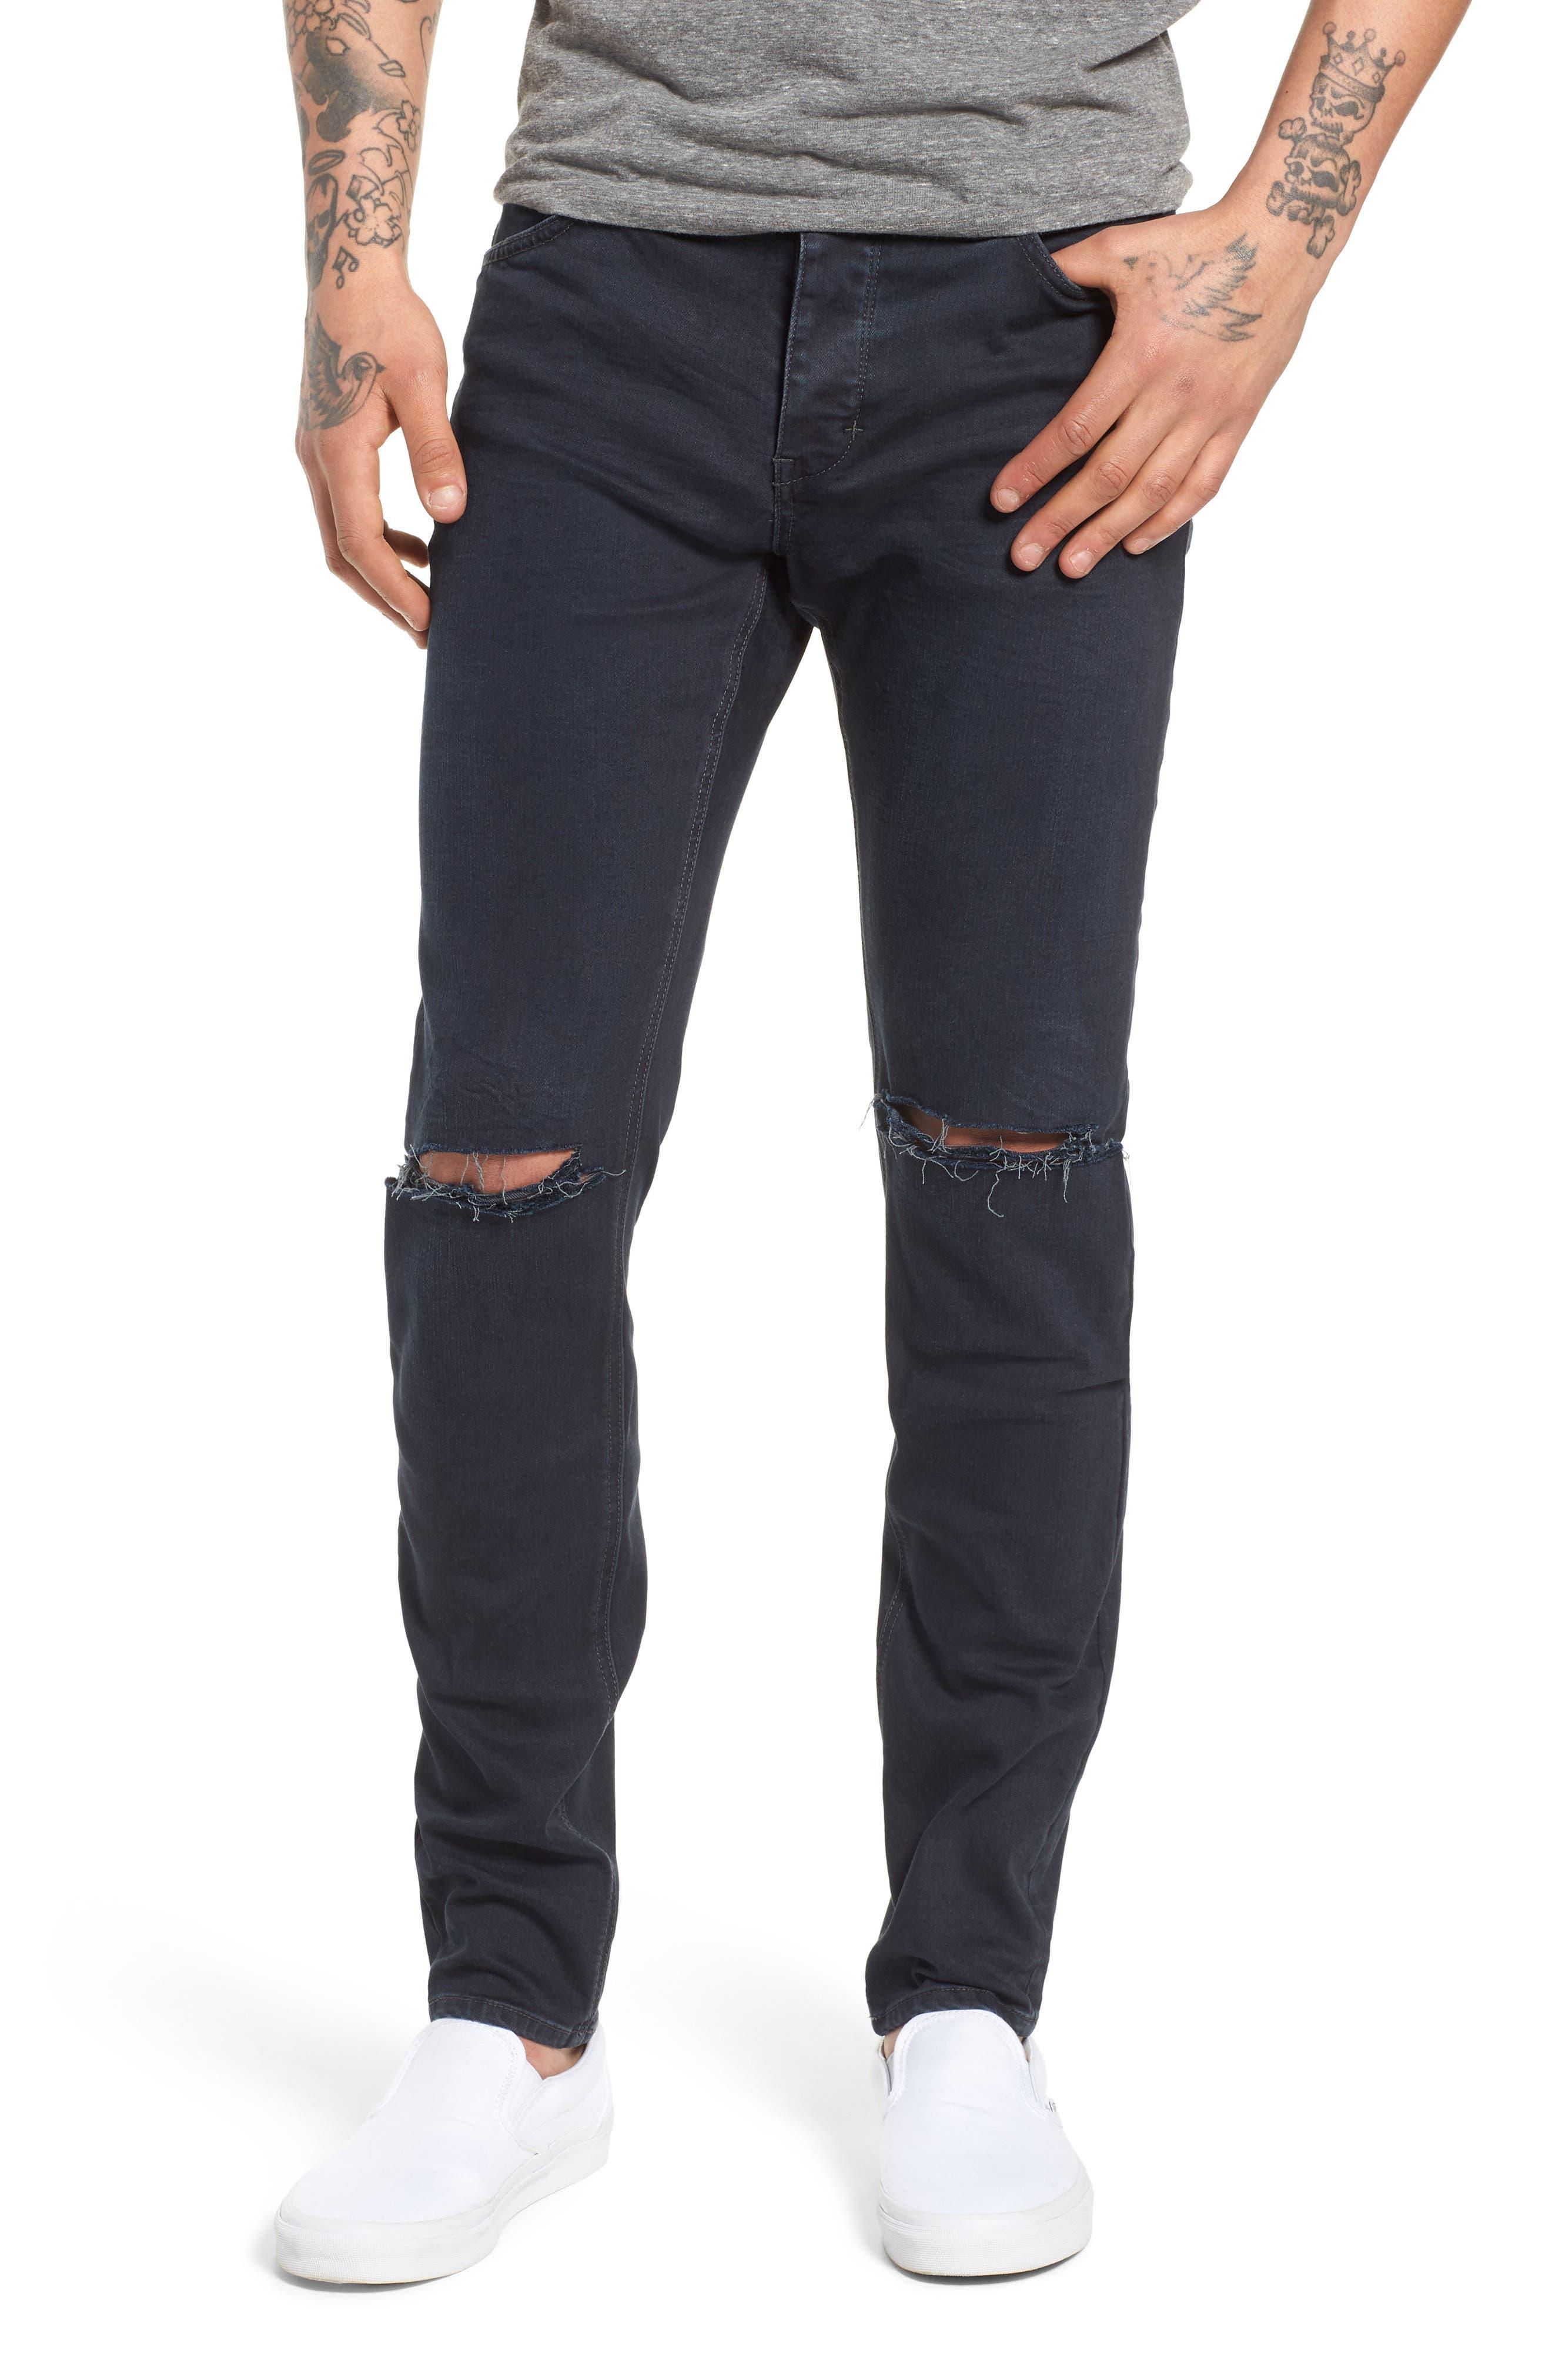 Iggy Skinny Fit Jeans,                         Main,                         color, Blue Lines Broken